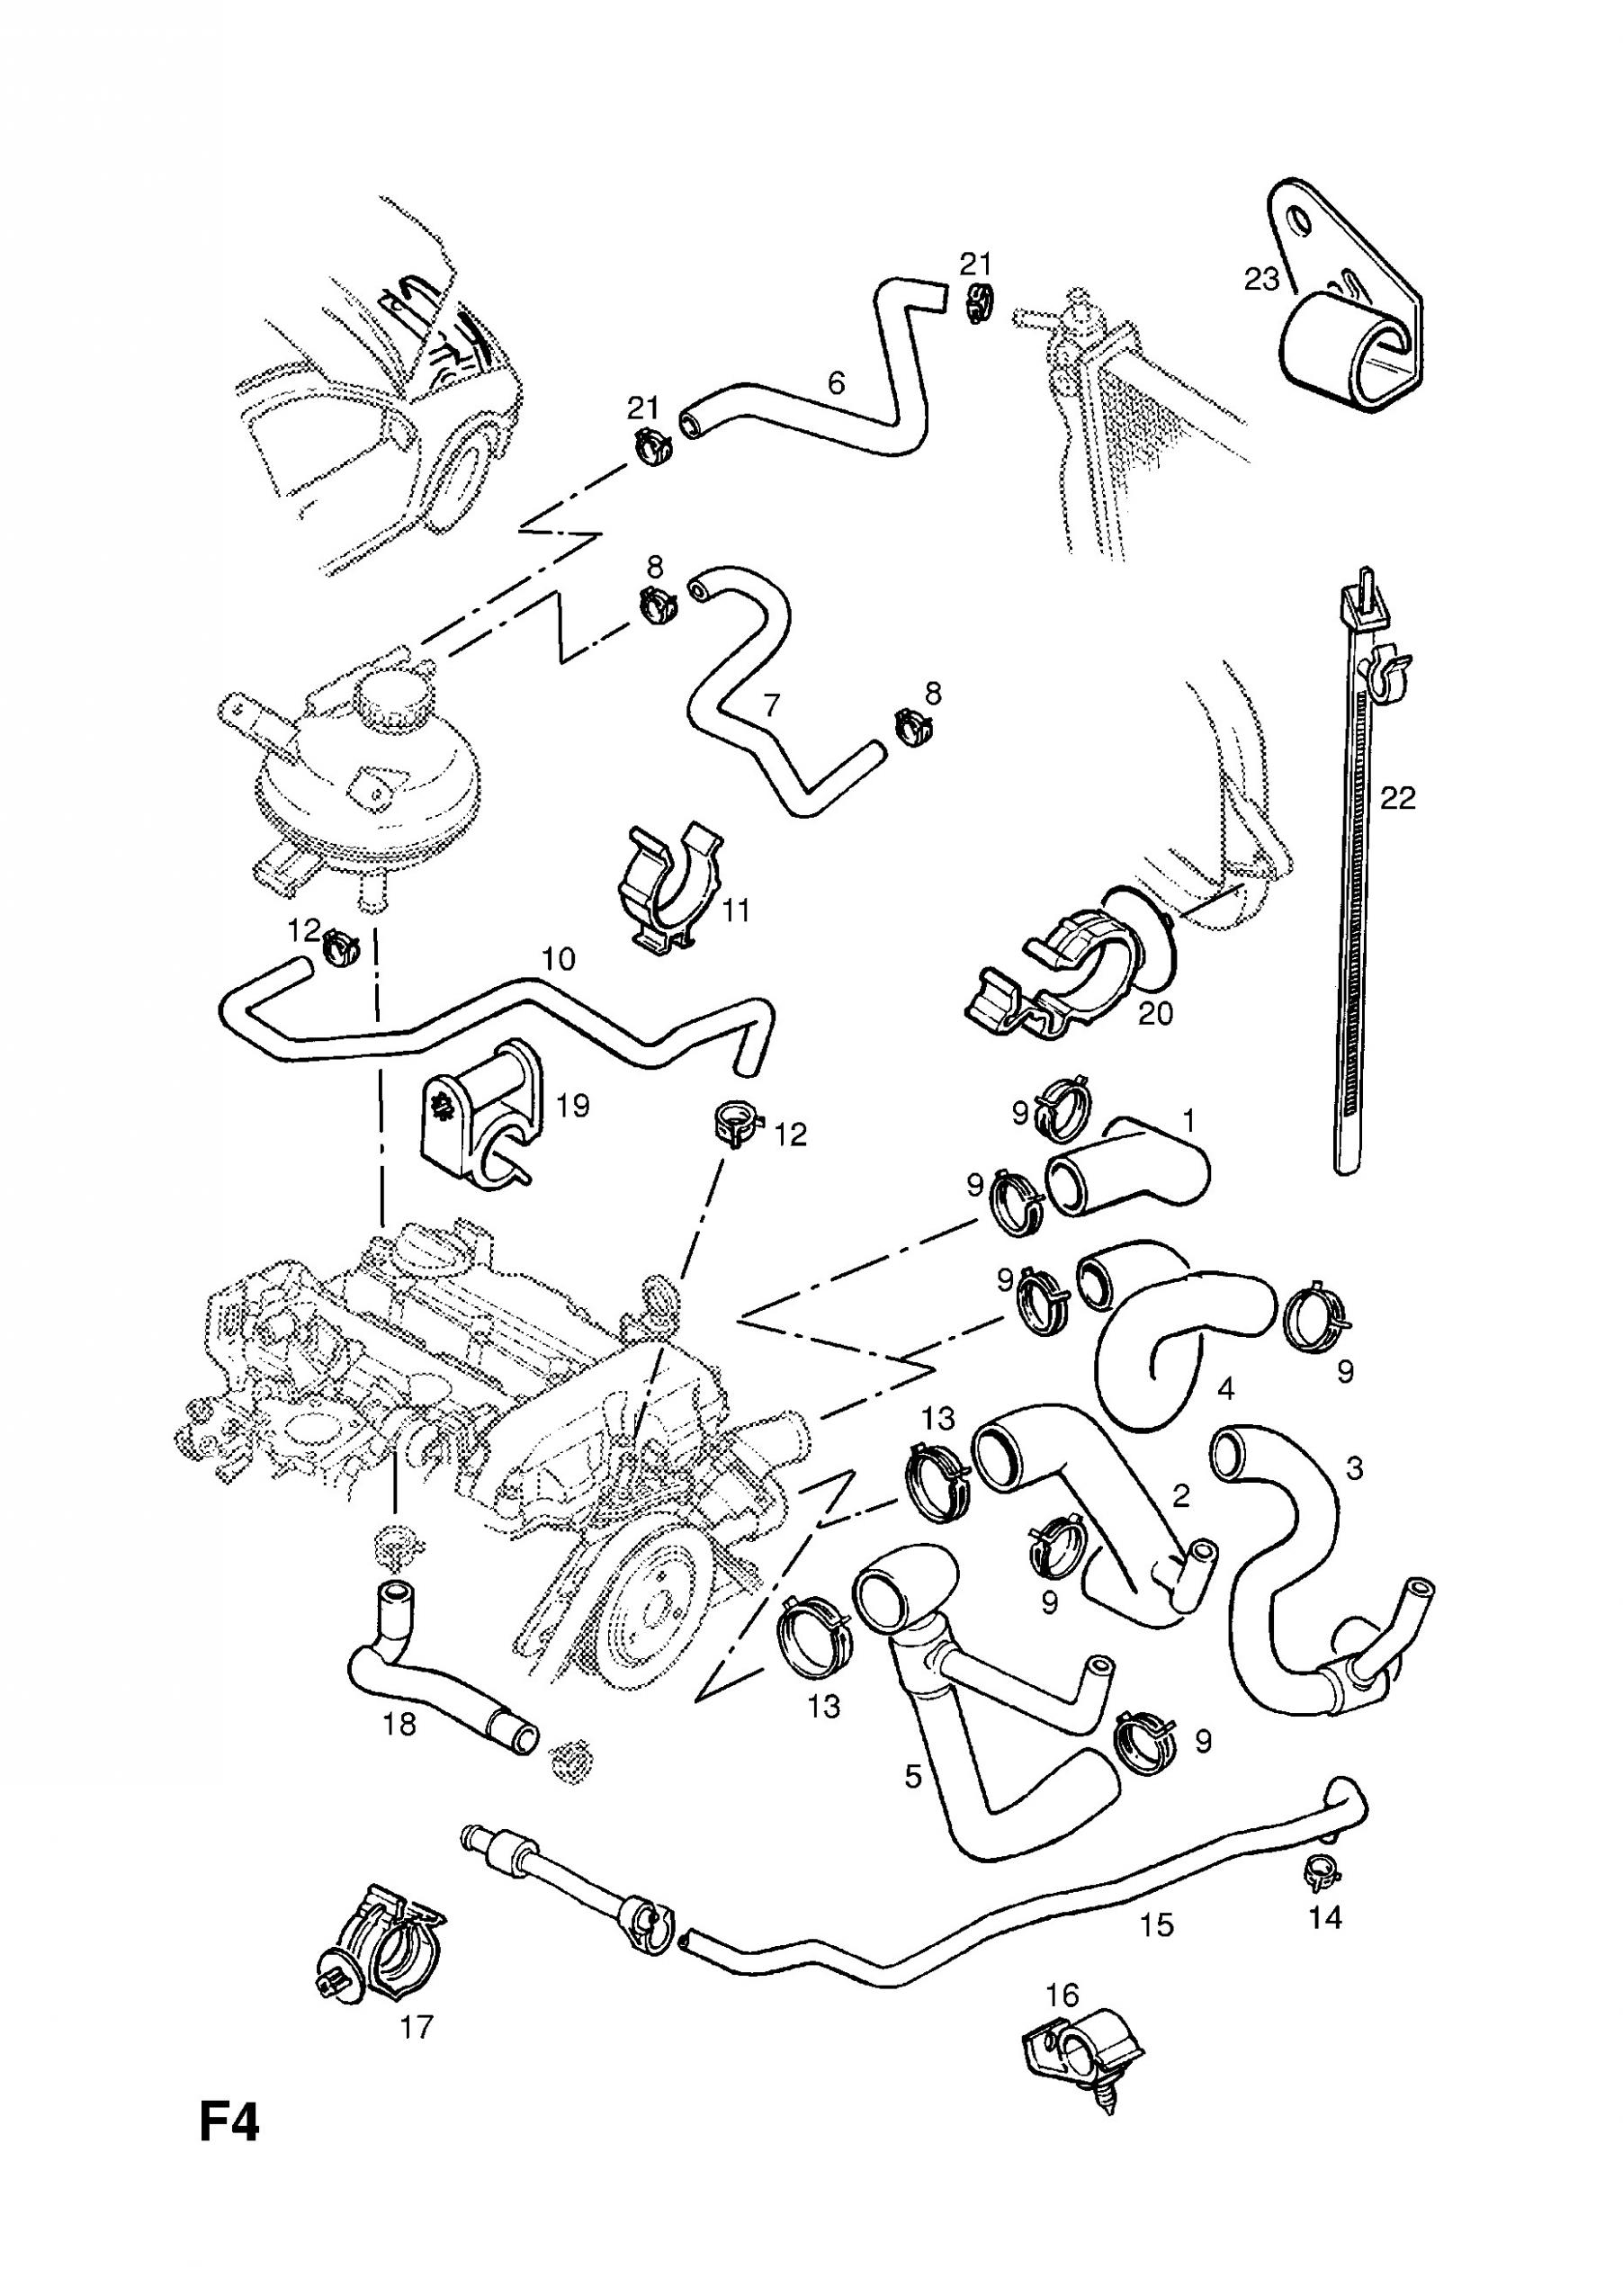 [DIAGRAM] Fuse Box Diagram For Corsa B